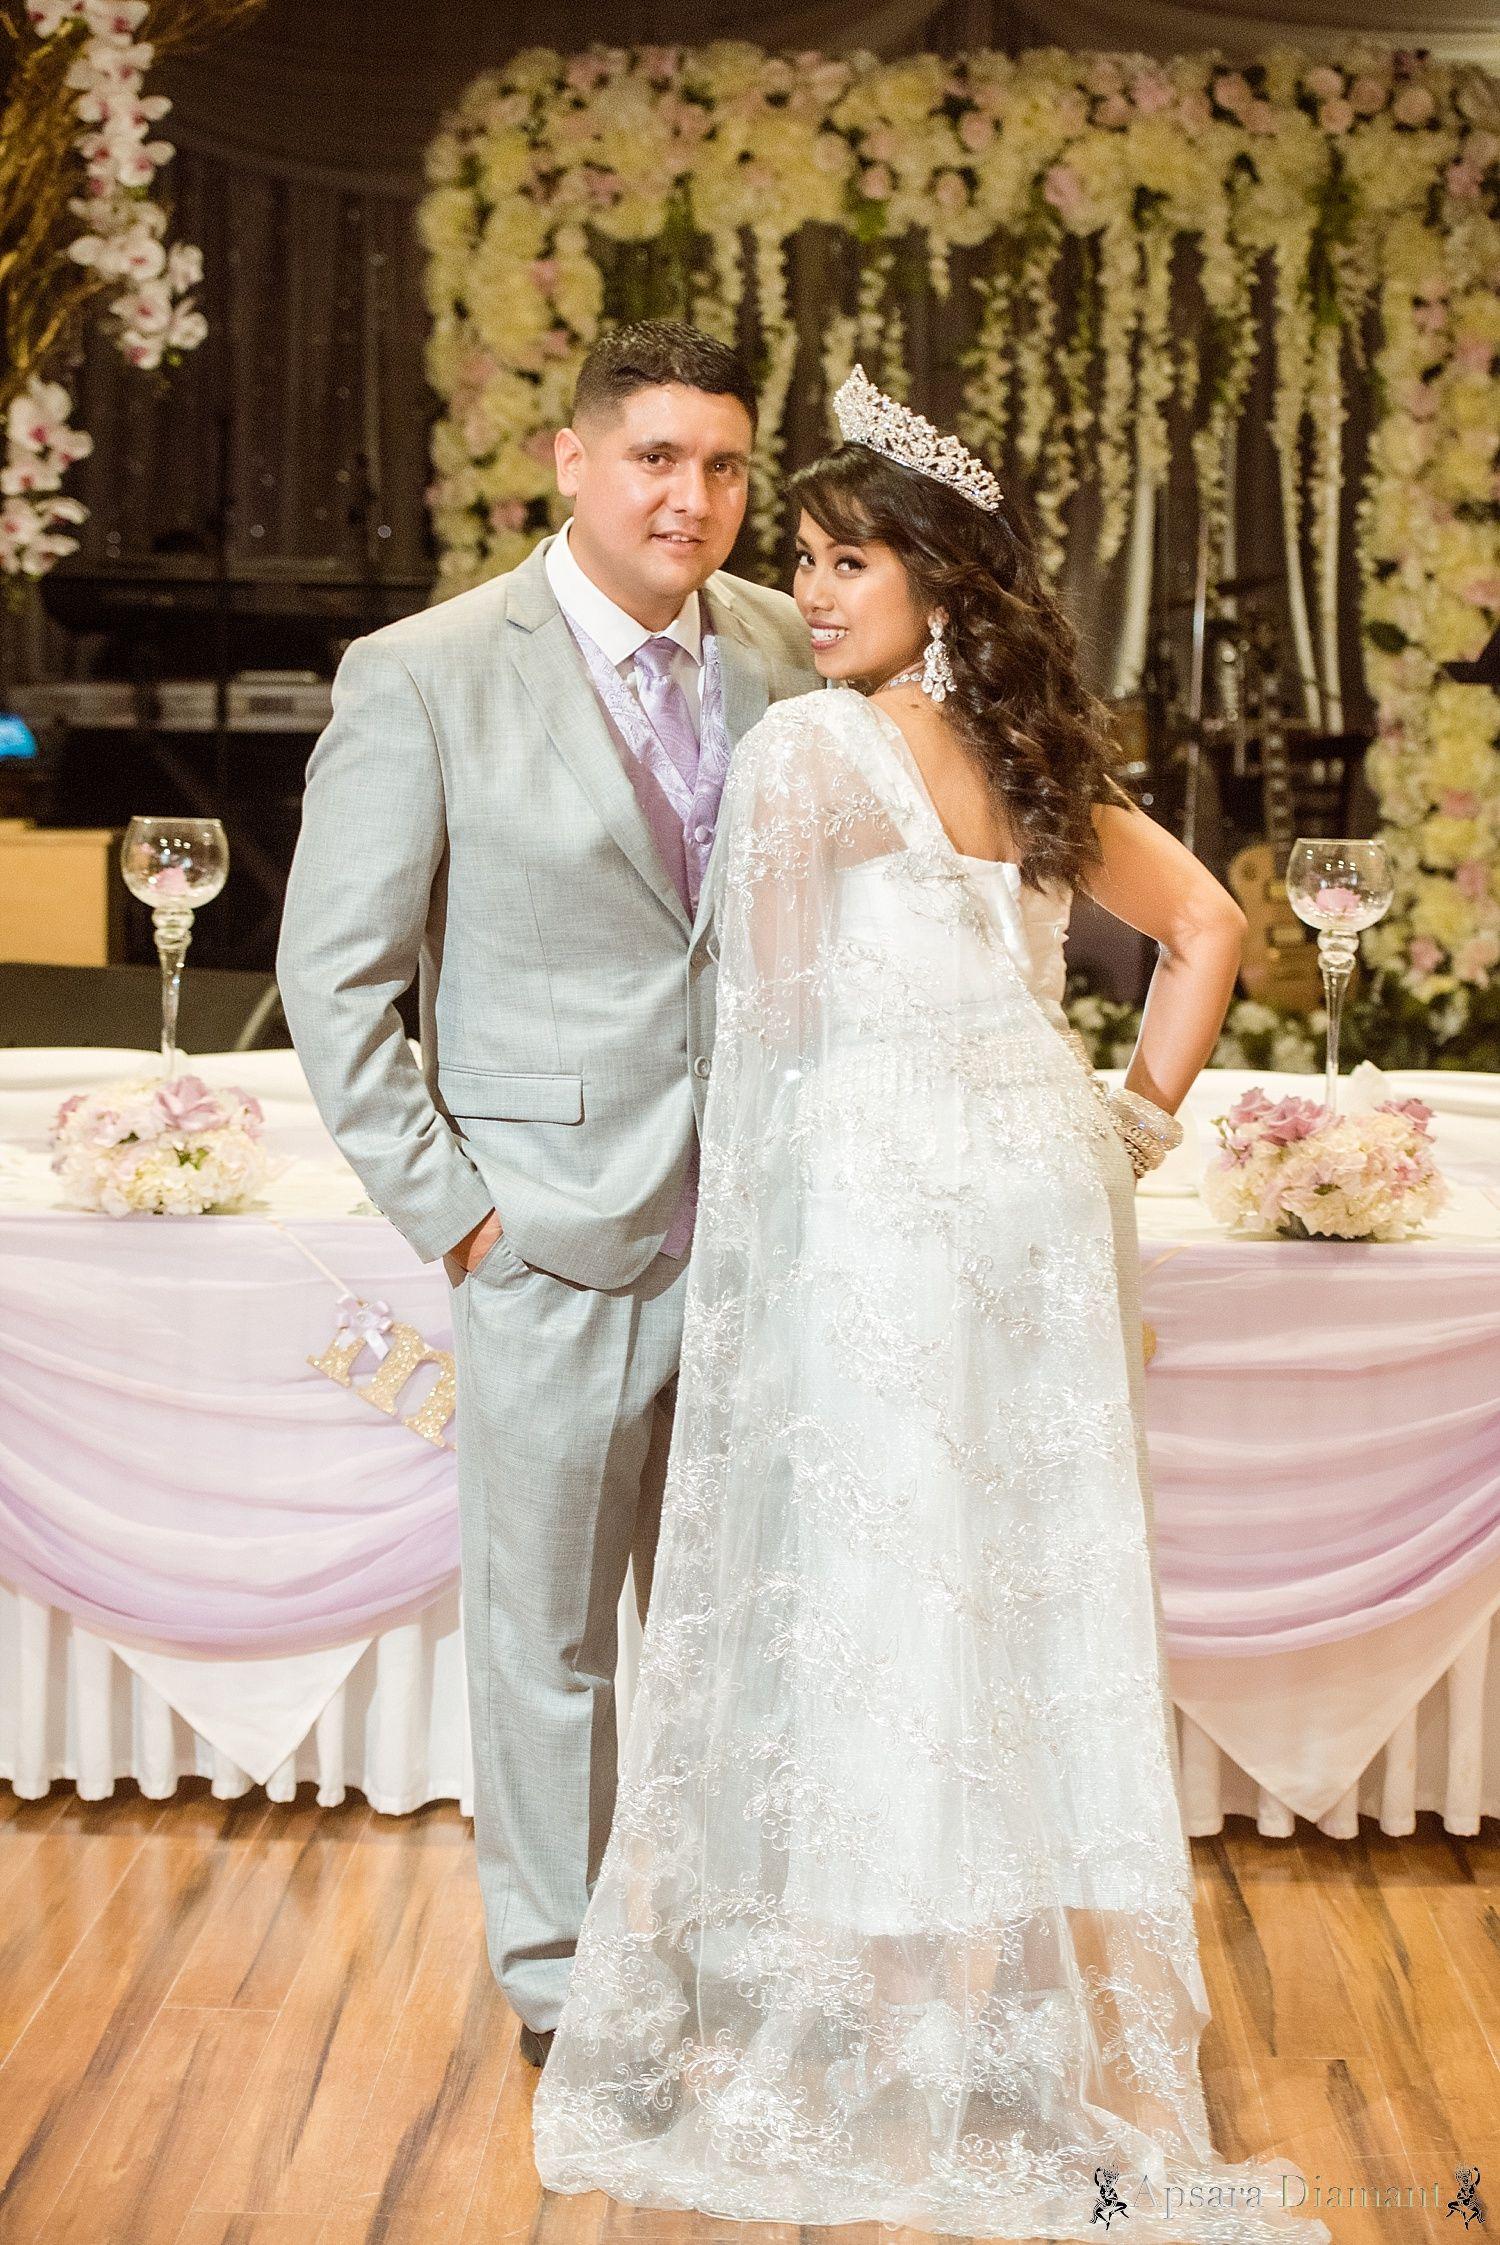 Dorable Khmer Hairstyle Wedding Frieze - The Wedding Ideas ...